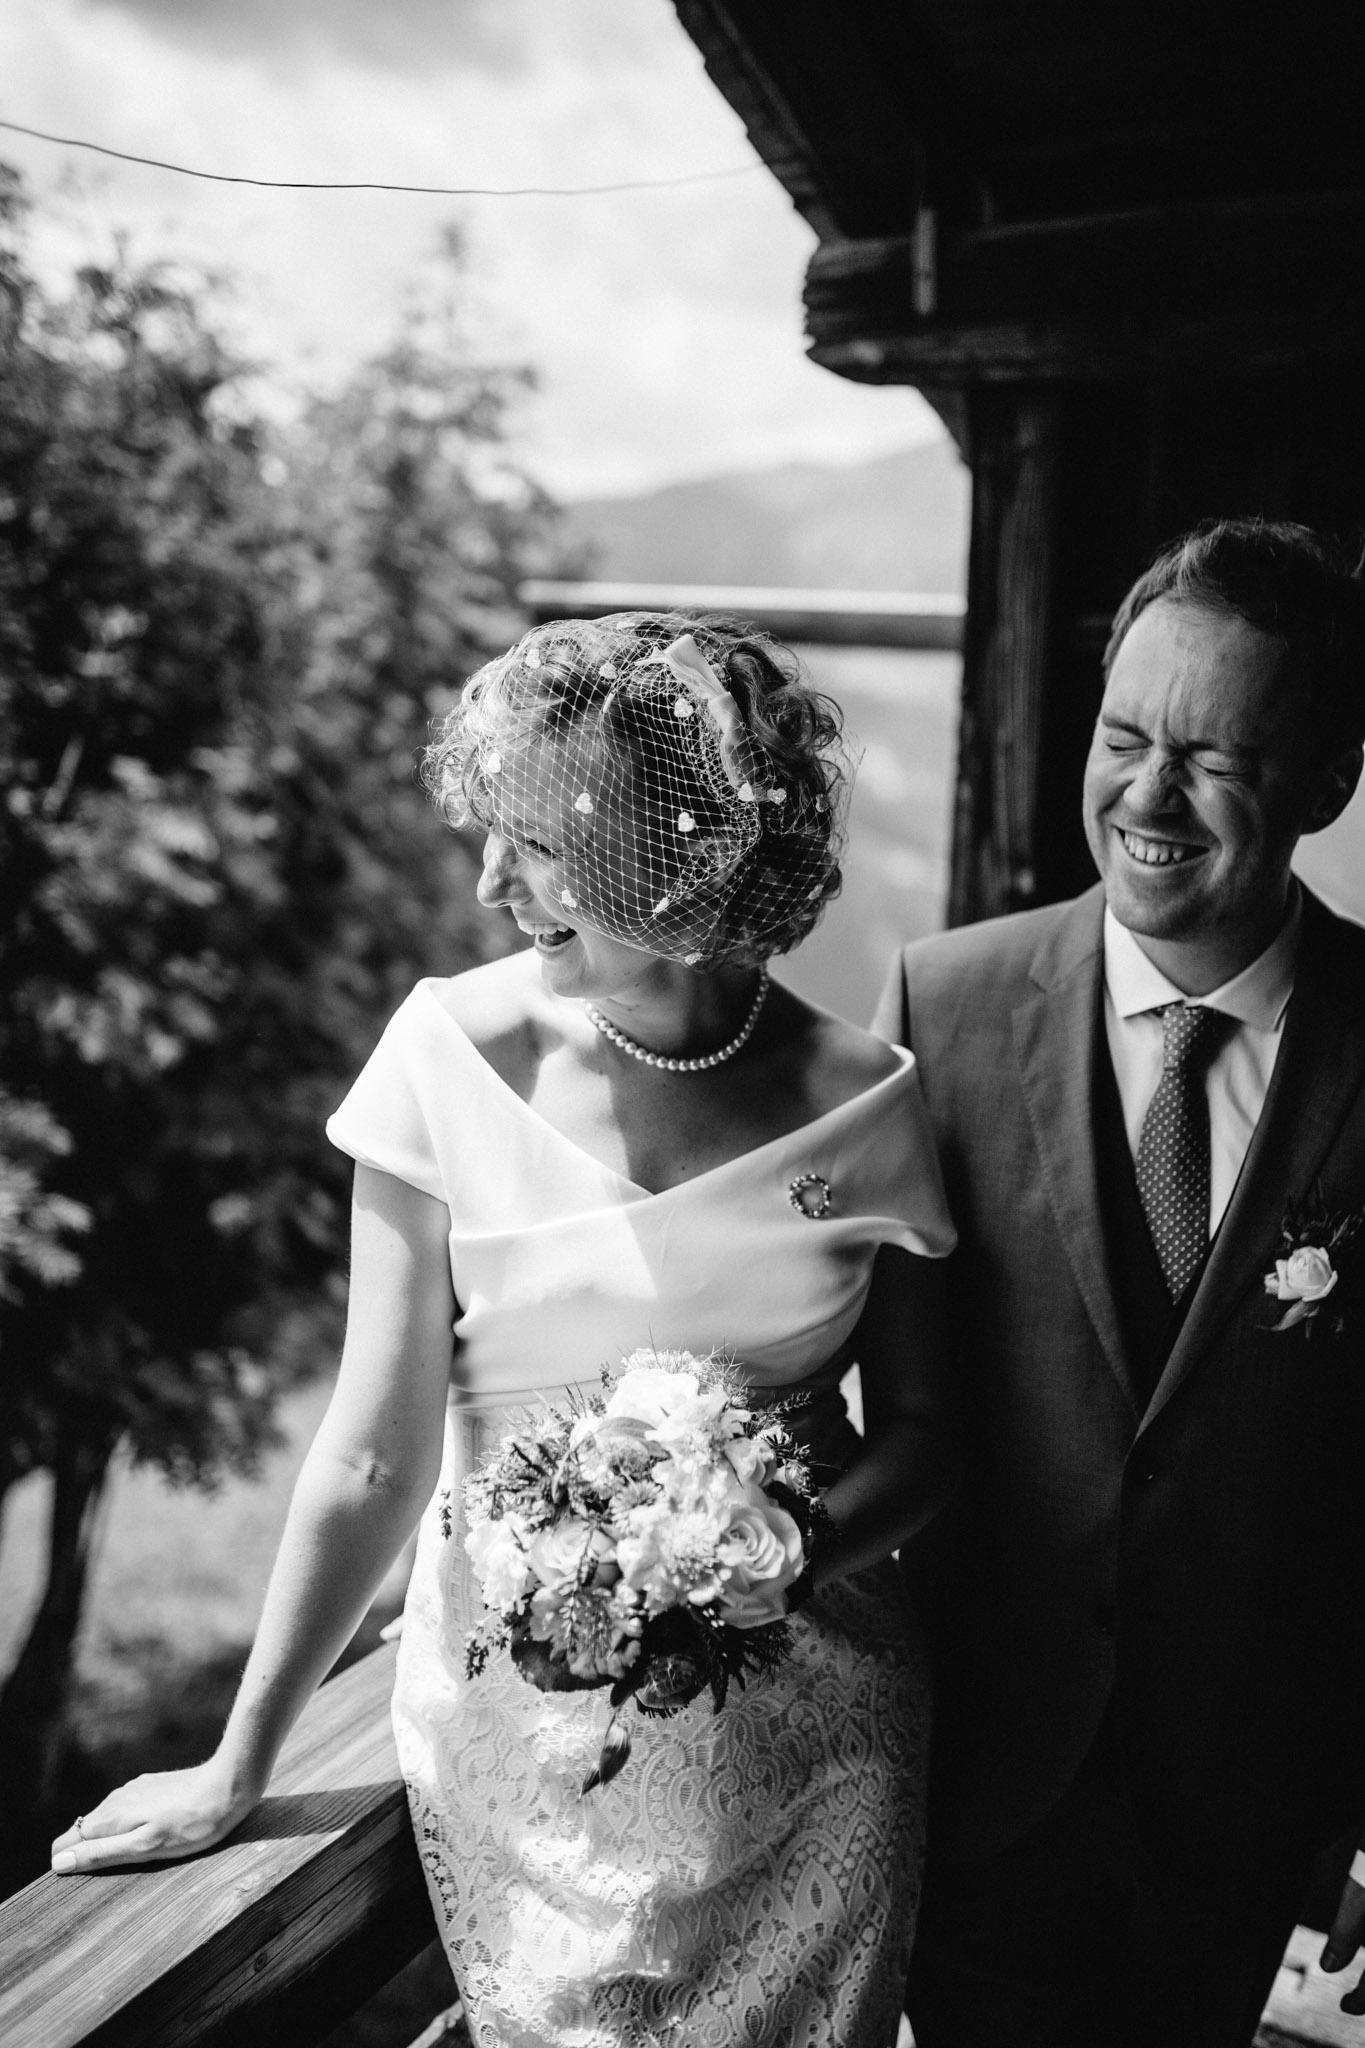 Lenl-Simmental-Buehlerhof-Pia-Anna-Christian-Wedding-Photography-EK-43.jpg